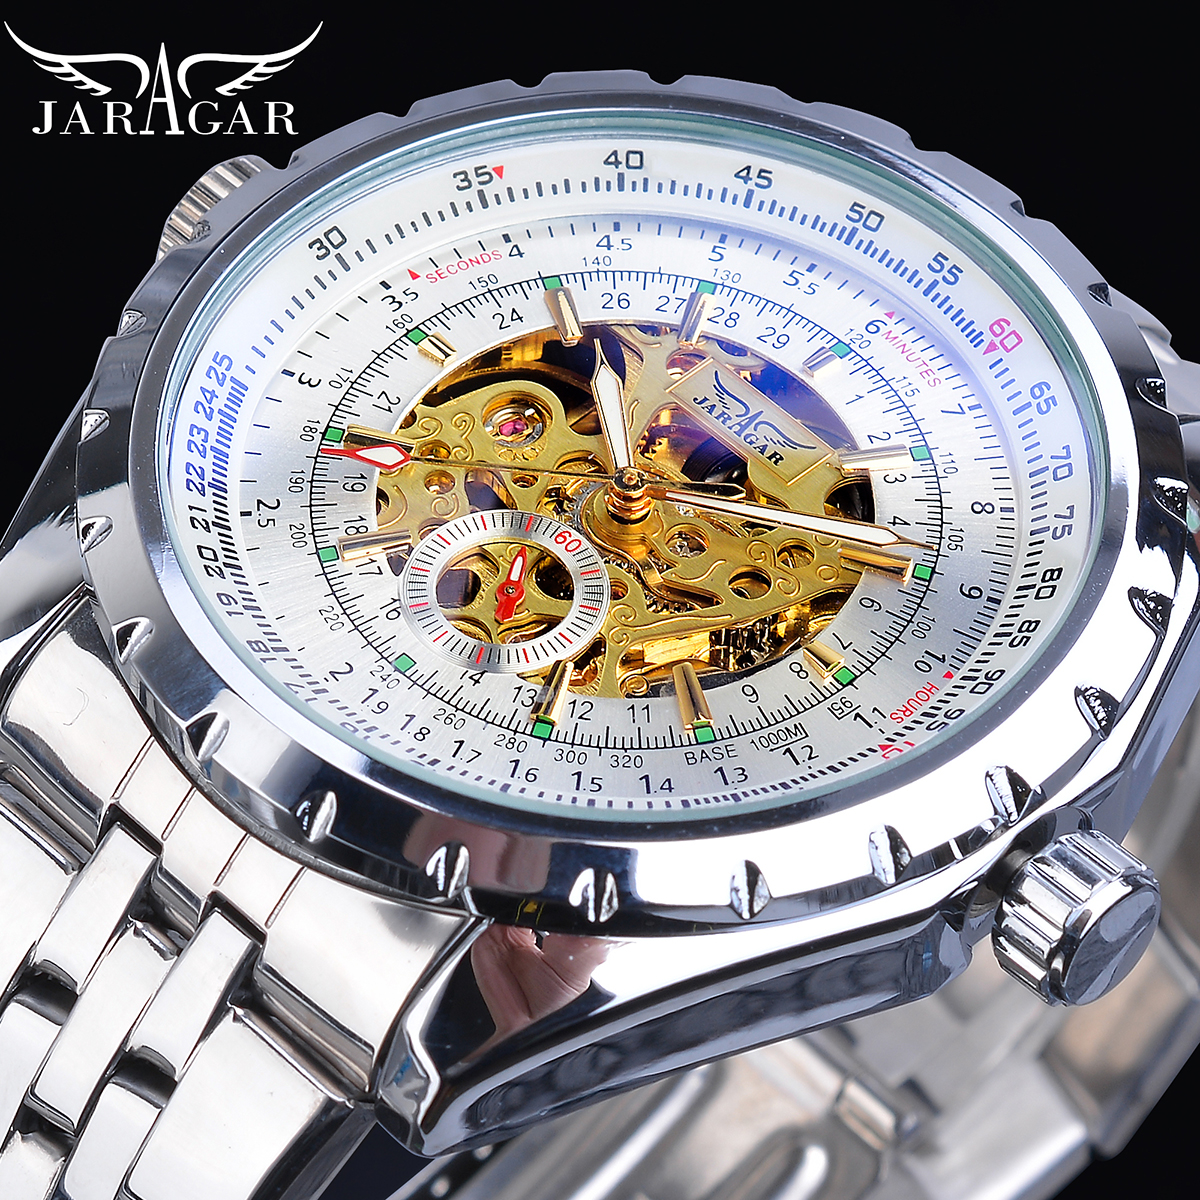 Jaragar Men Watches Automatic 2019 Silver White Male Steel Band Self-Wind Mechanical Watch Analog Sport Army Military Wristwatch